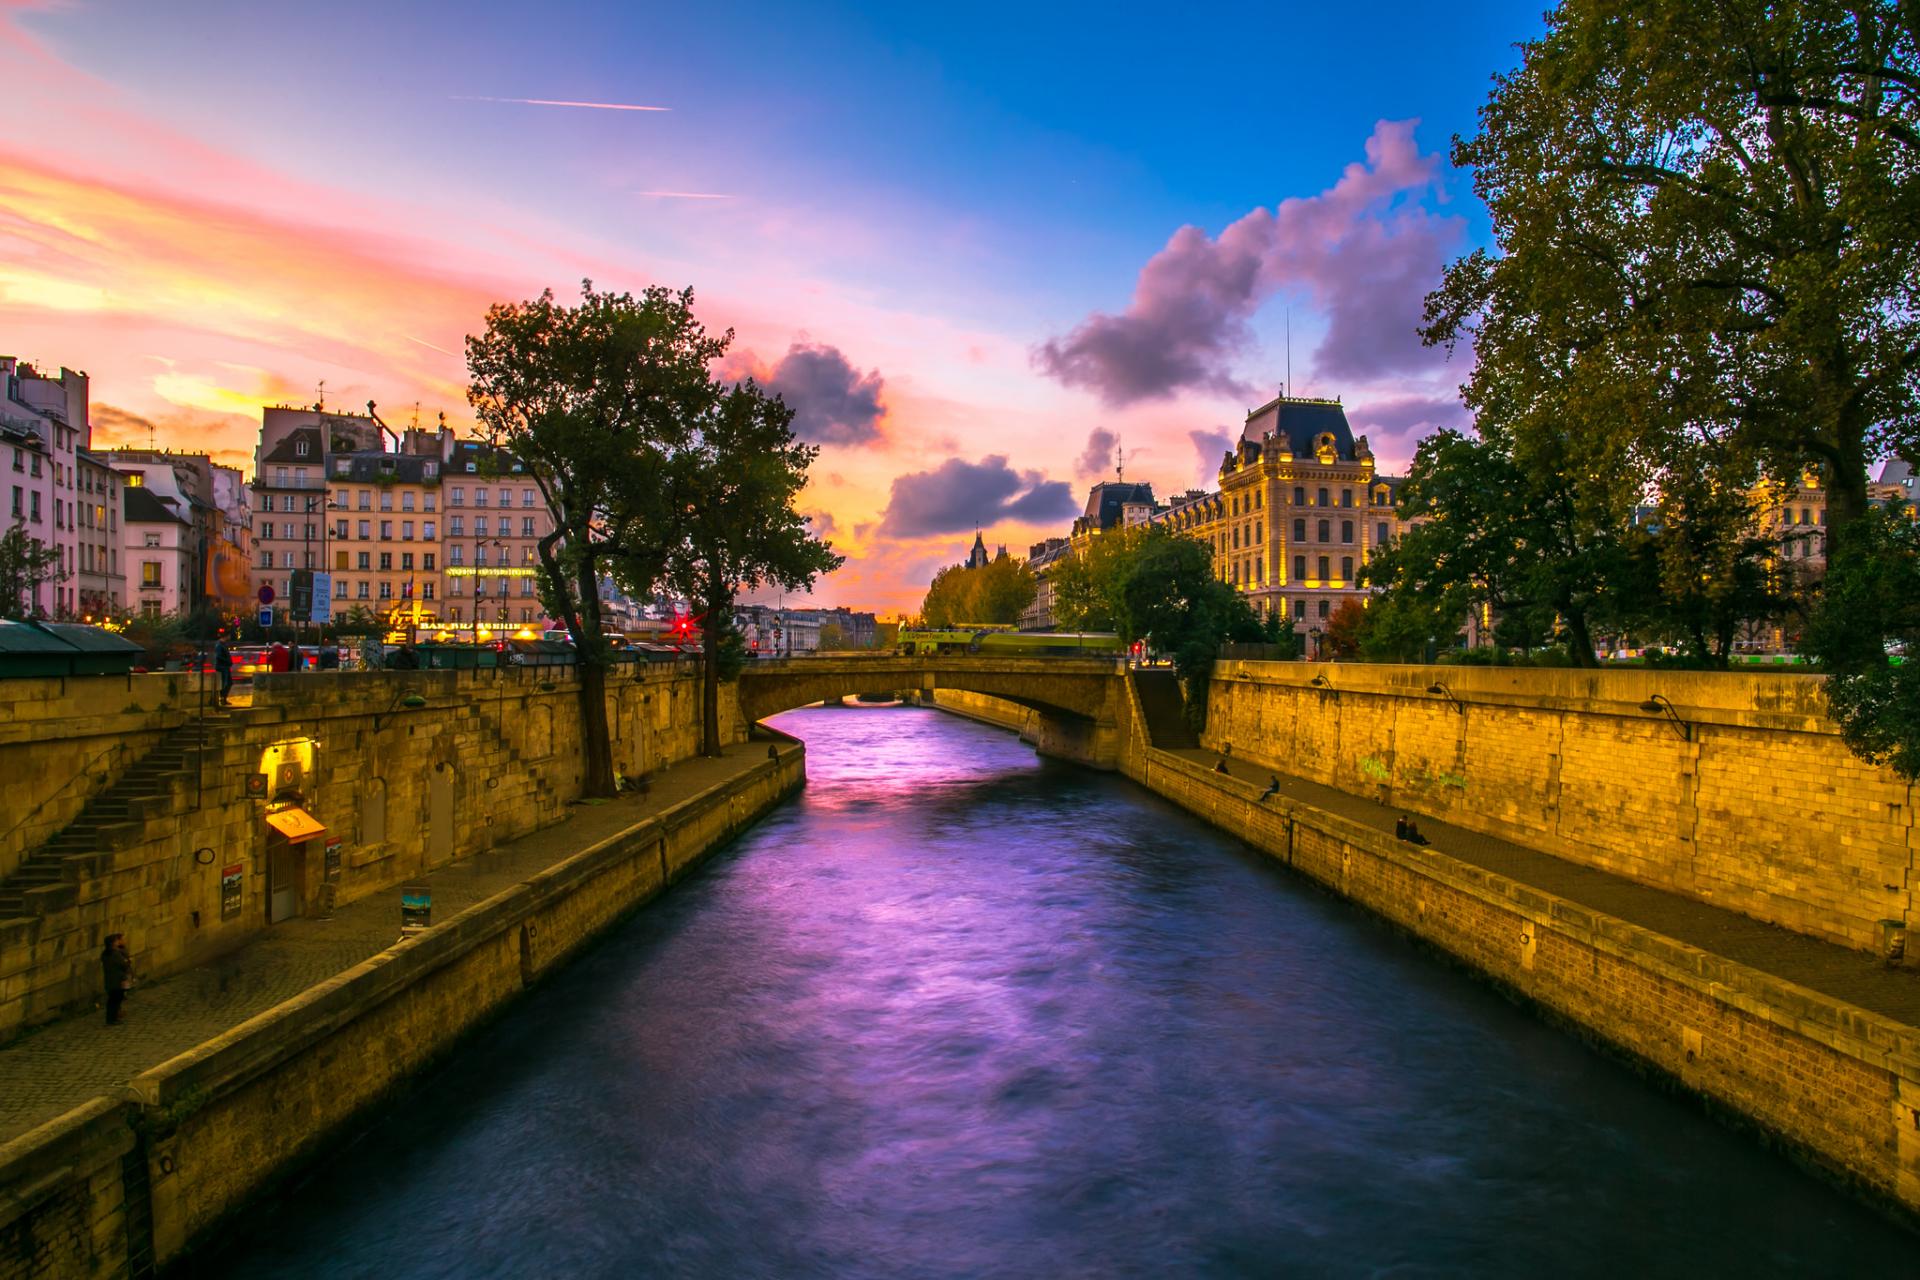 29 Fondos de pantalla de París, Wallpapers HD